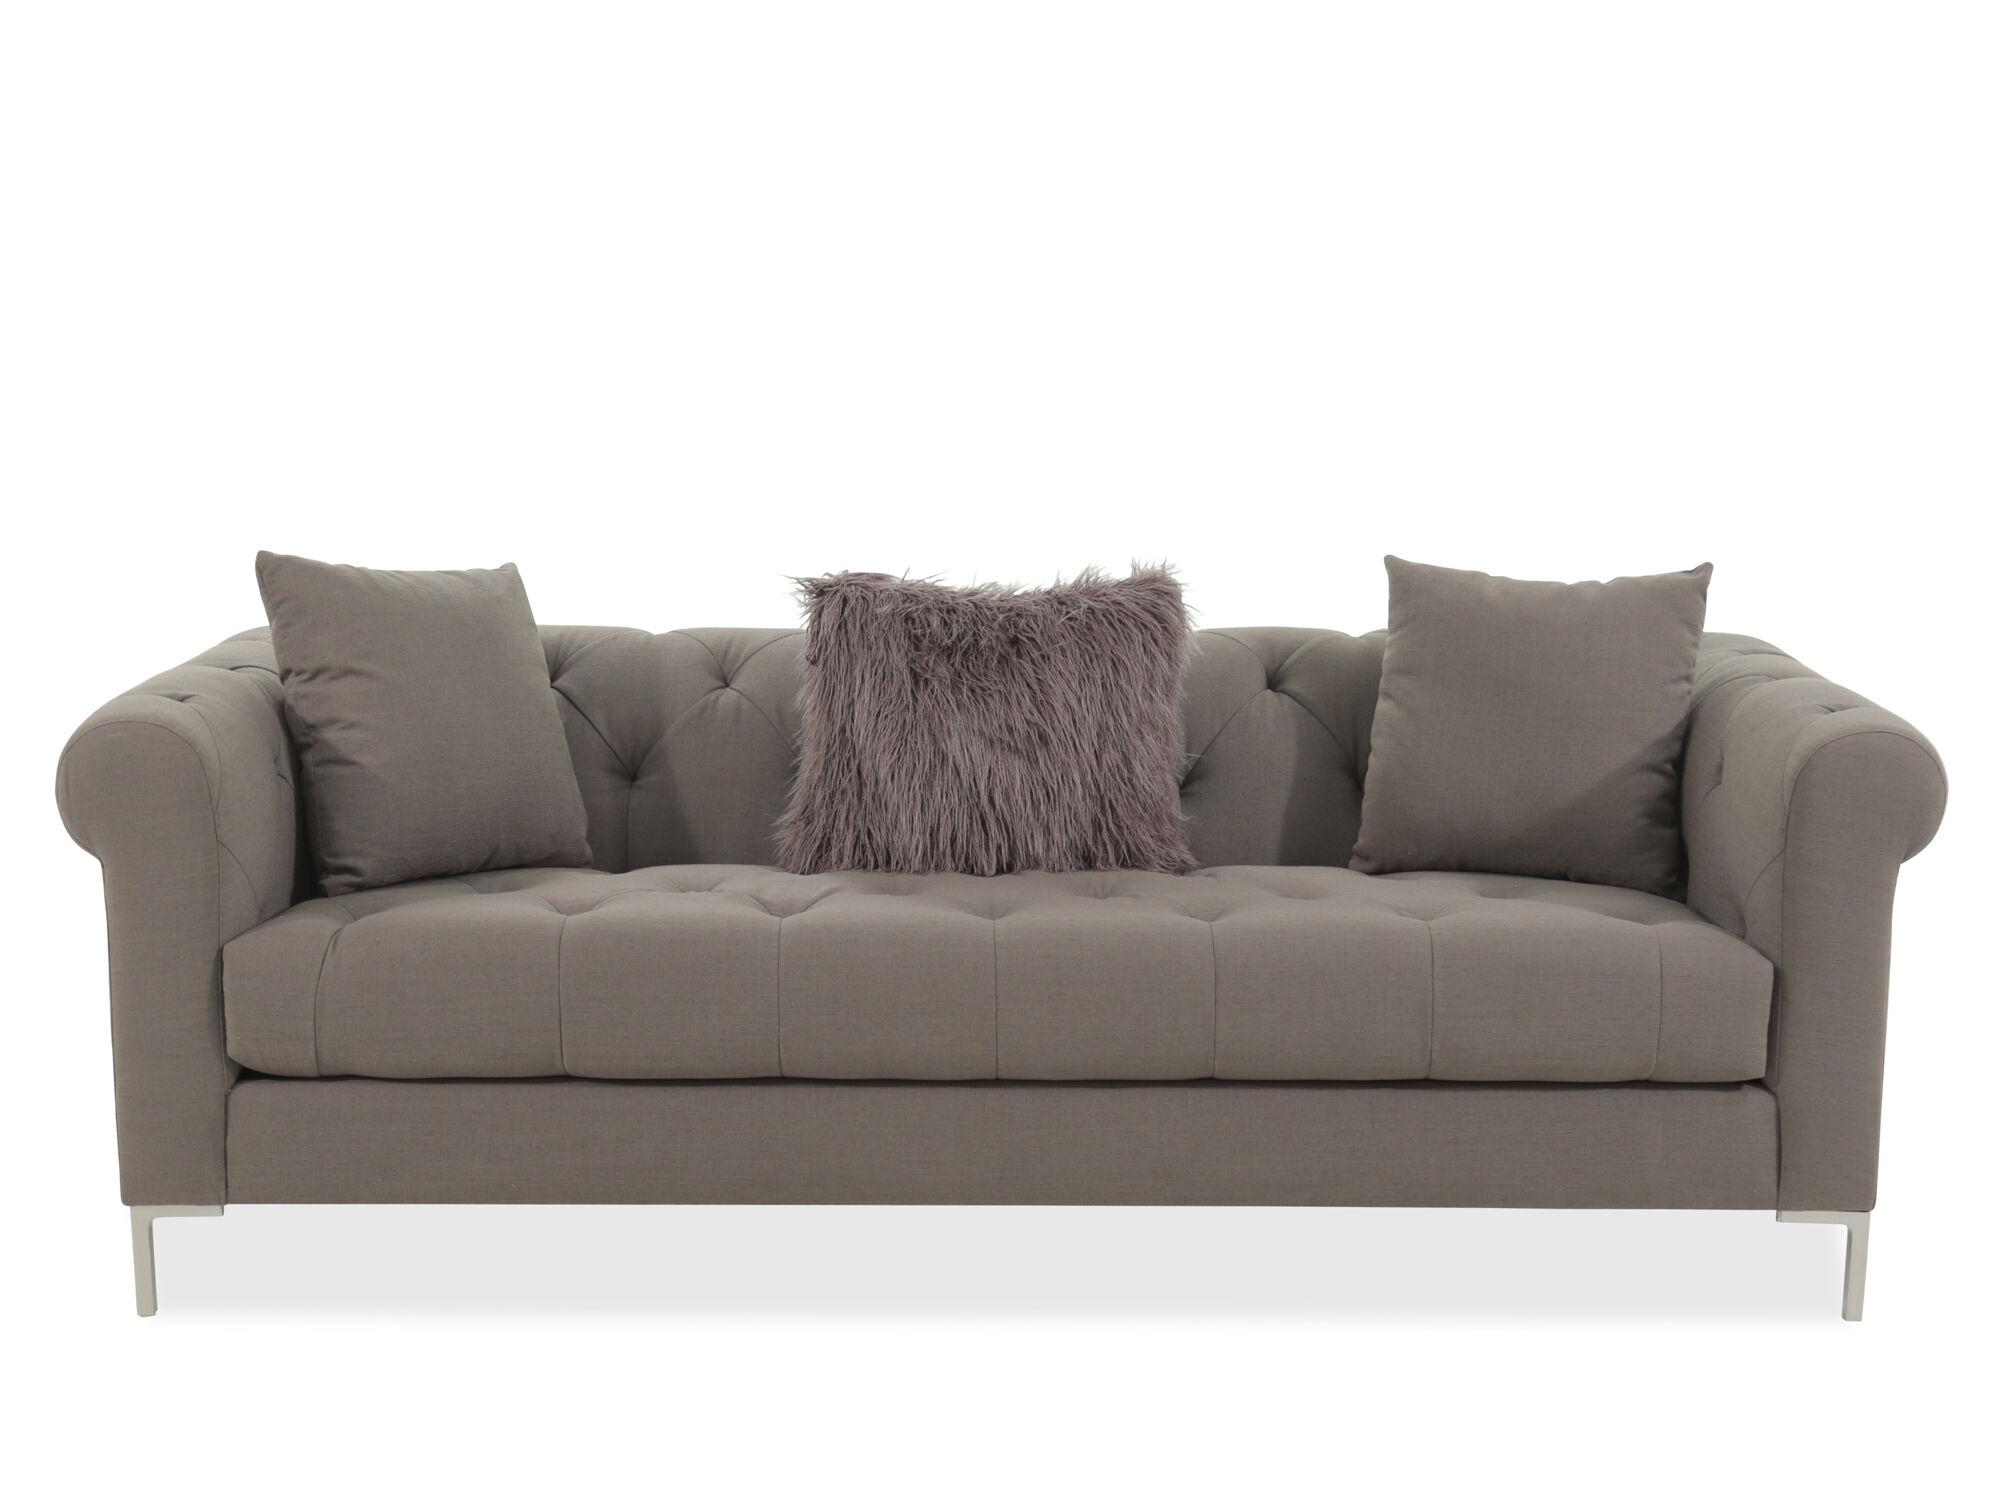 jonathan louis sofas sofa bed corner sale carter gray mathis brothers furniture